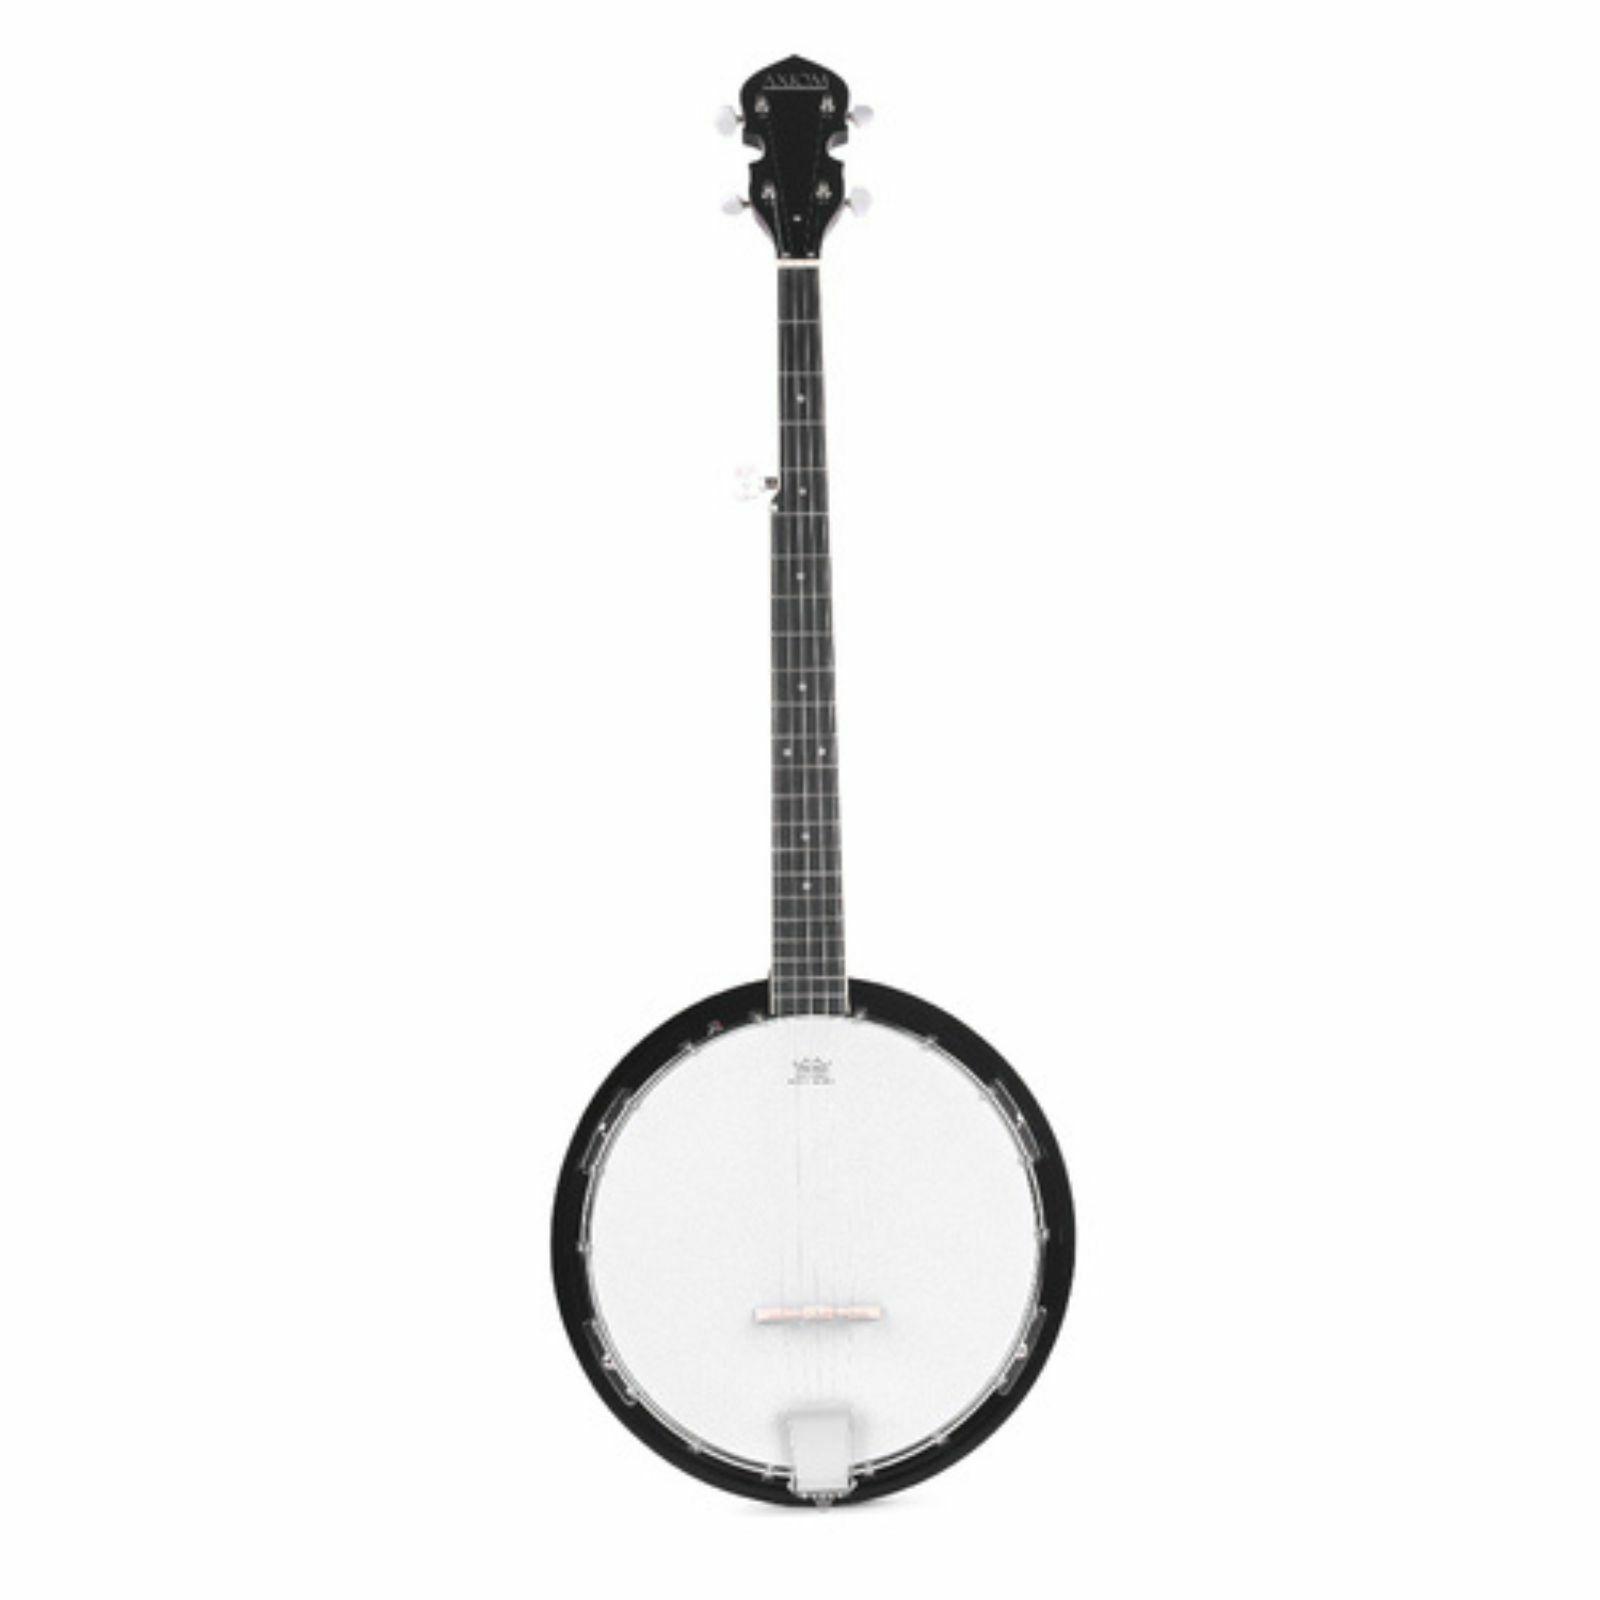 5 String Beginners Banjo